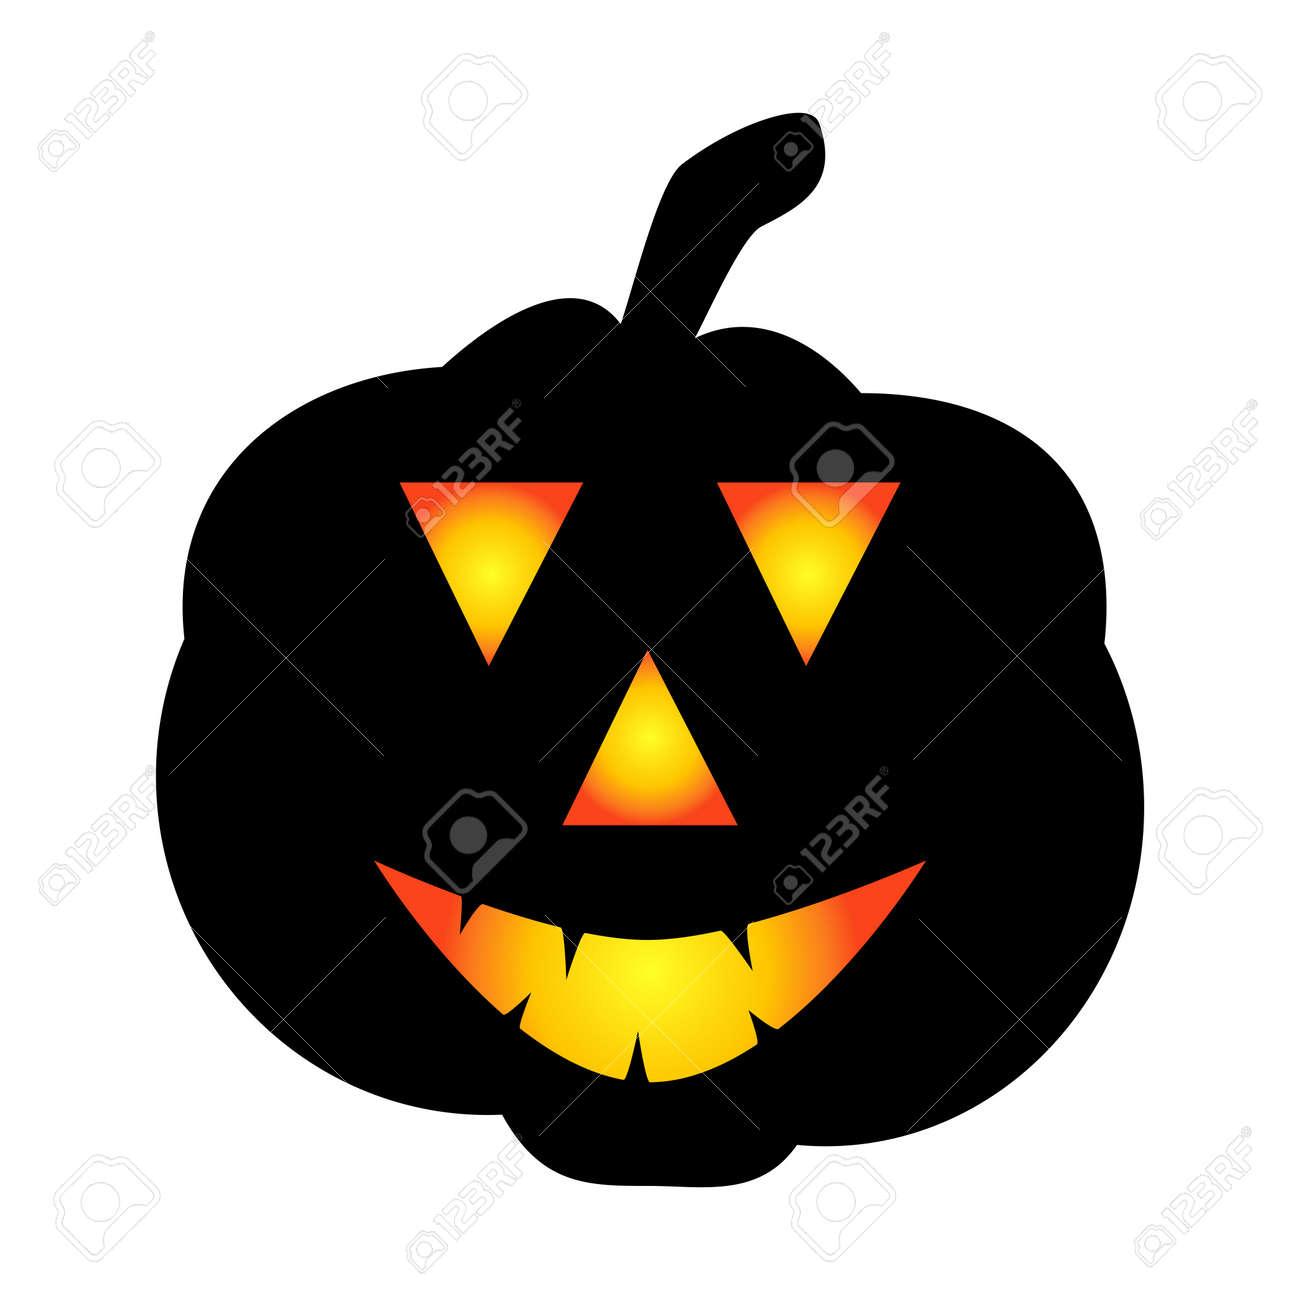 Halloween pumpkin icon. Autumn symbol. Halloween scary pumpkin with a smile, burning eyes. Cartoon colorful illustration. - 170549892